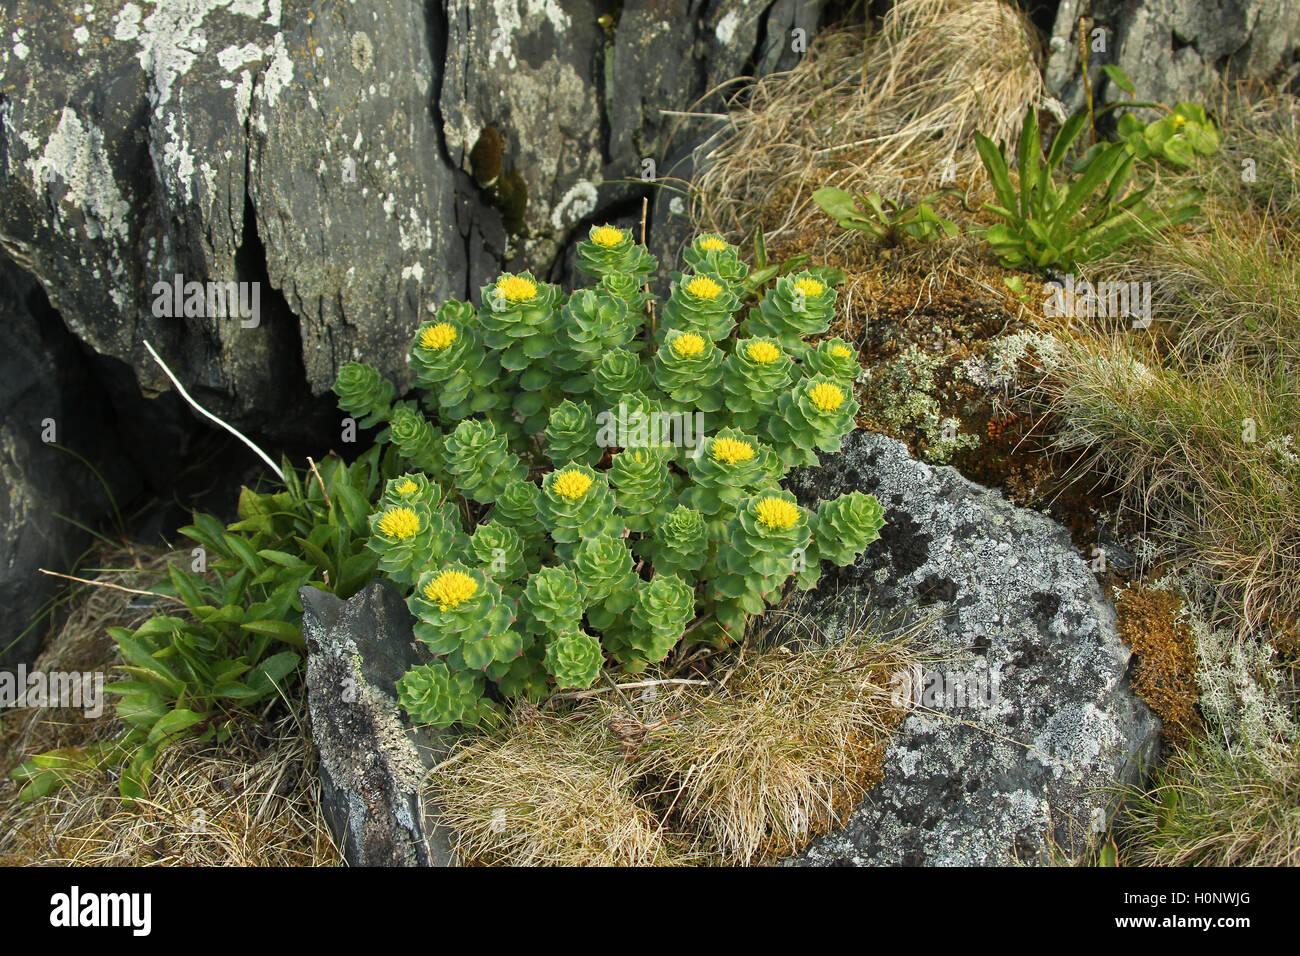 Goldmoss Fetthenne (Sedum acre), Tundra, Fjäll, Nordnorwegen, Norwegen, Skandinavien Stockbild